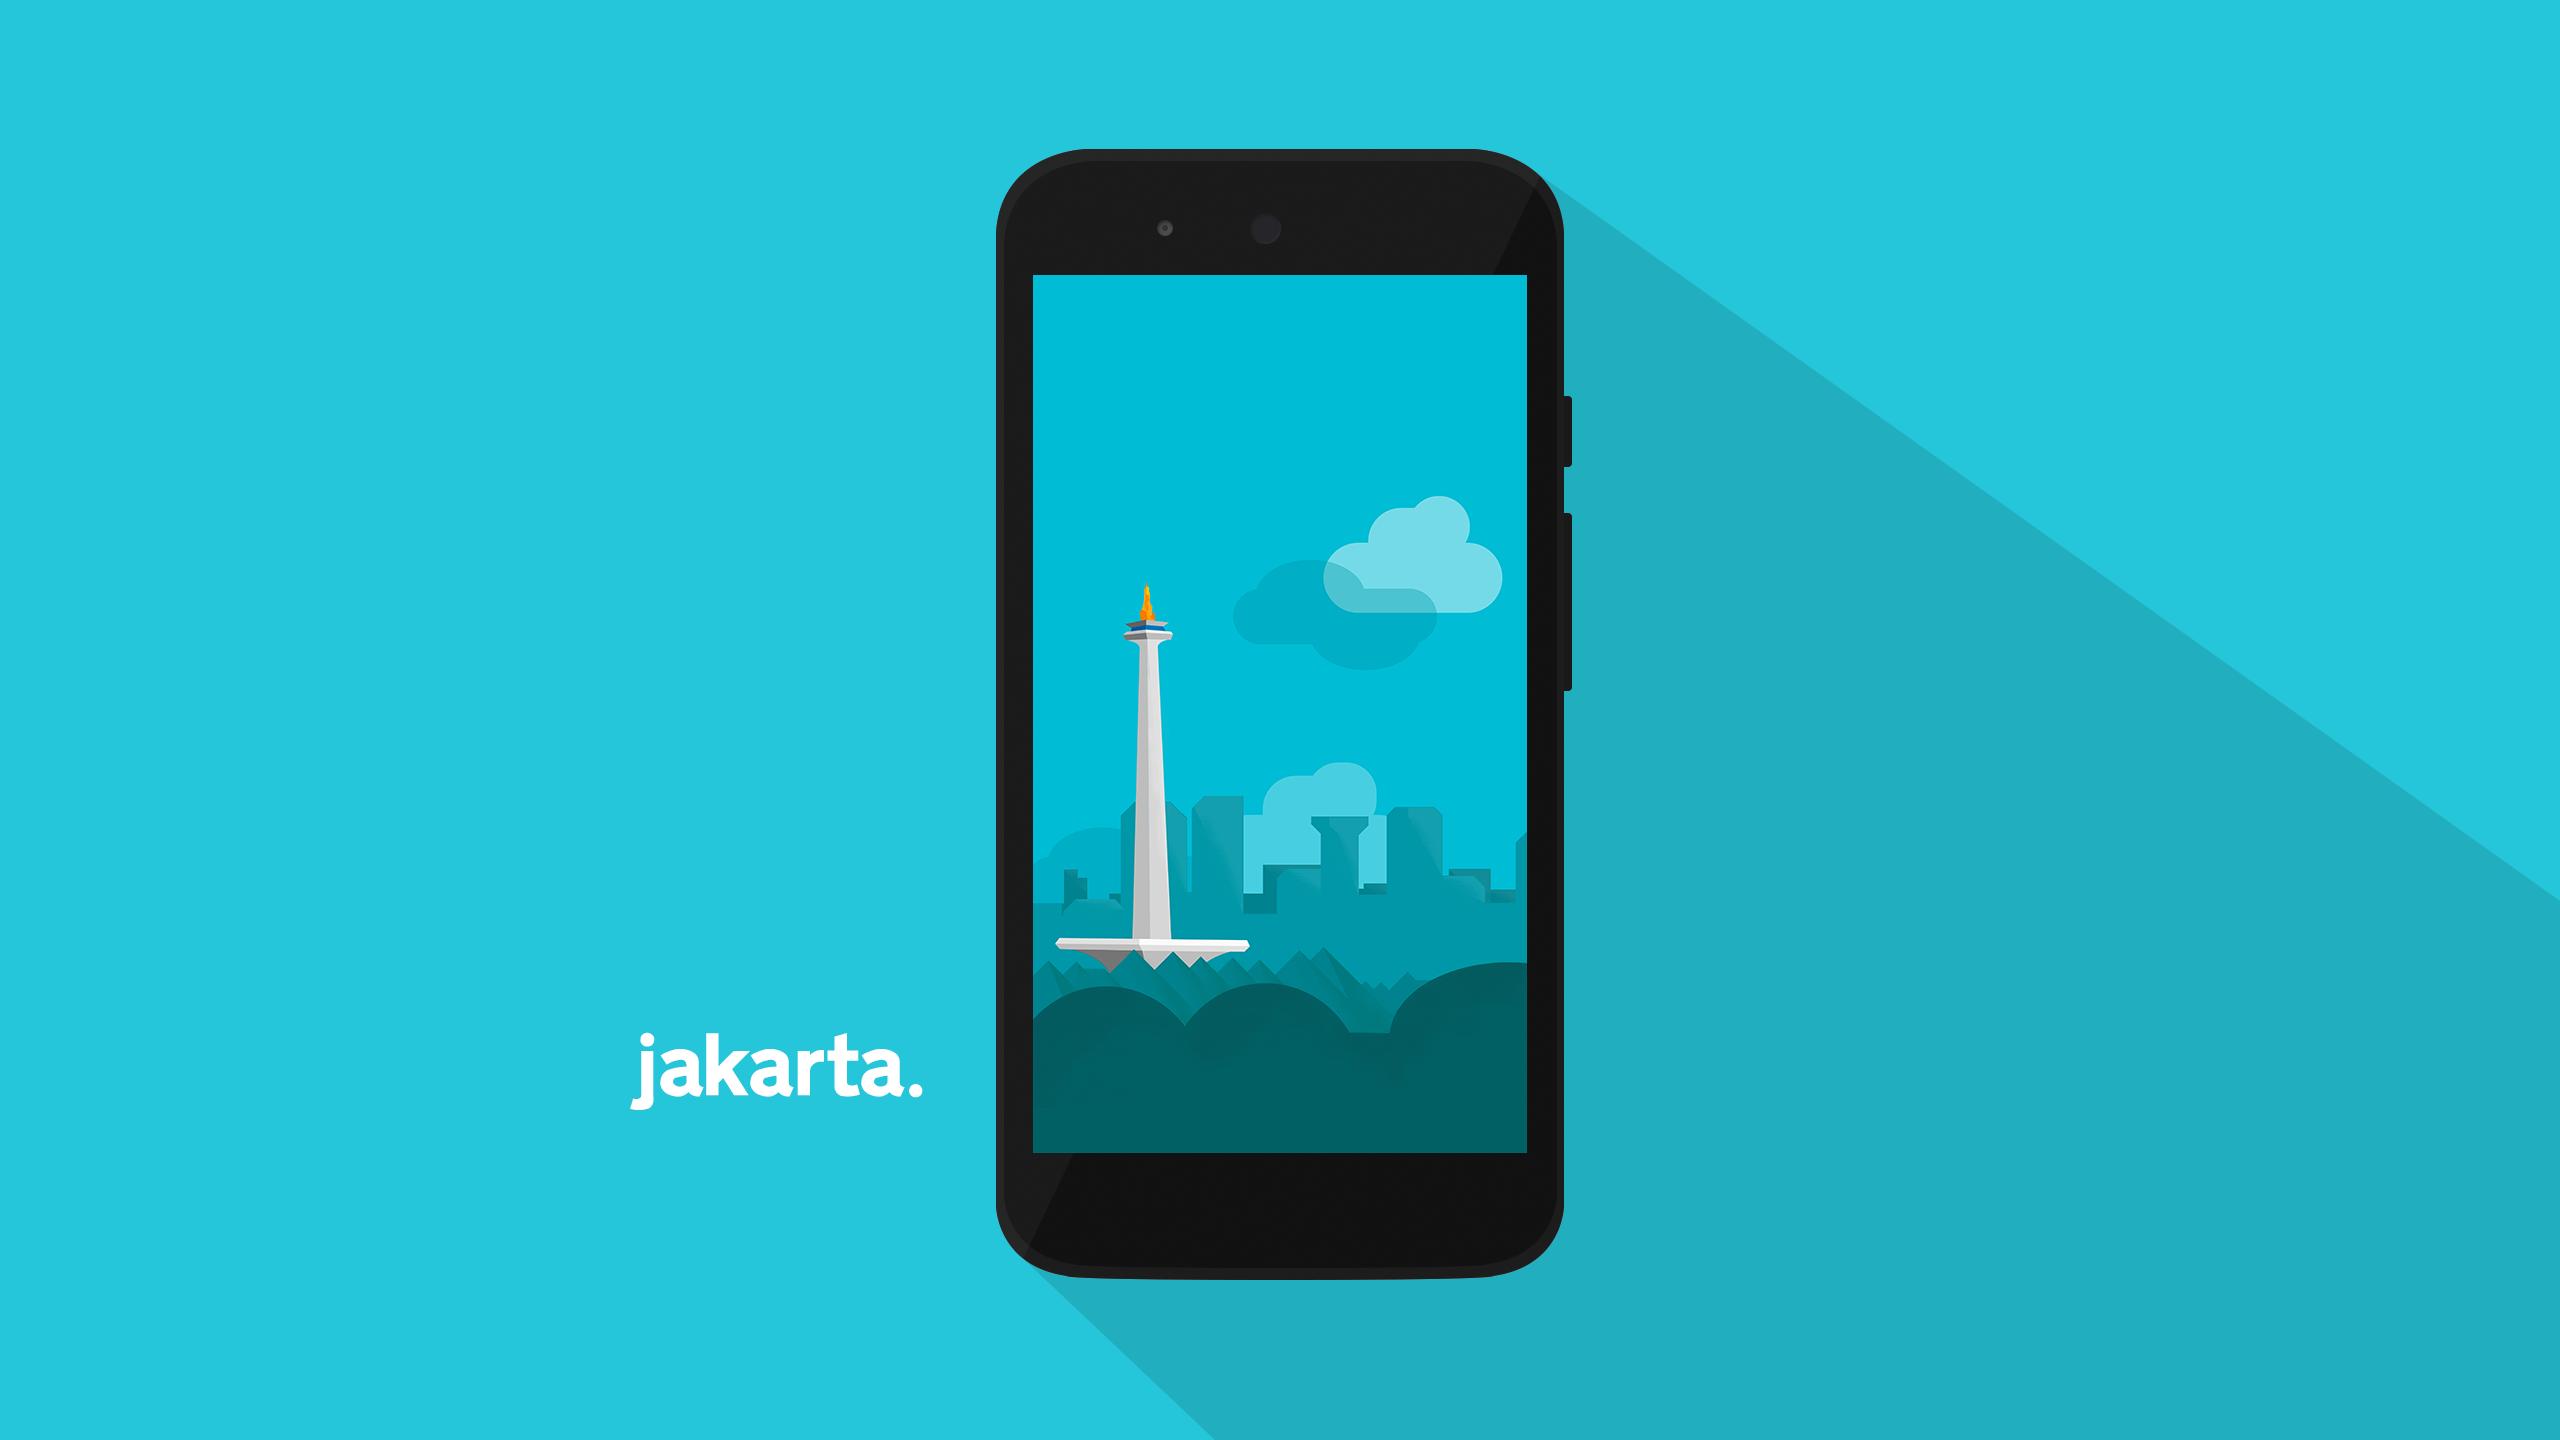 Jakarta National Monument MONAS 2880x5120 By Jandyaditya